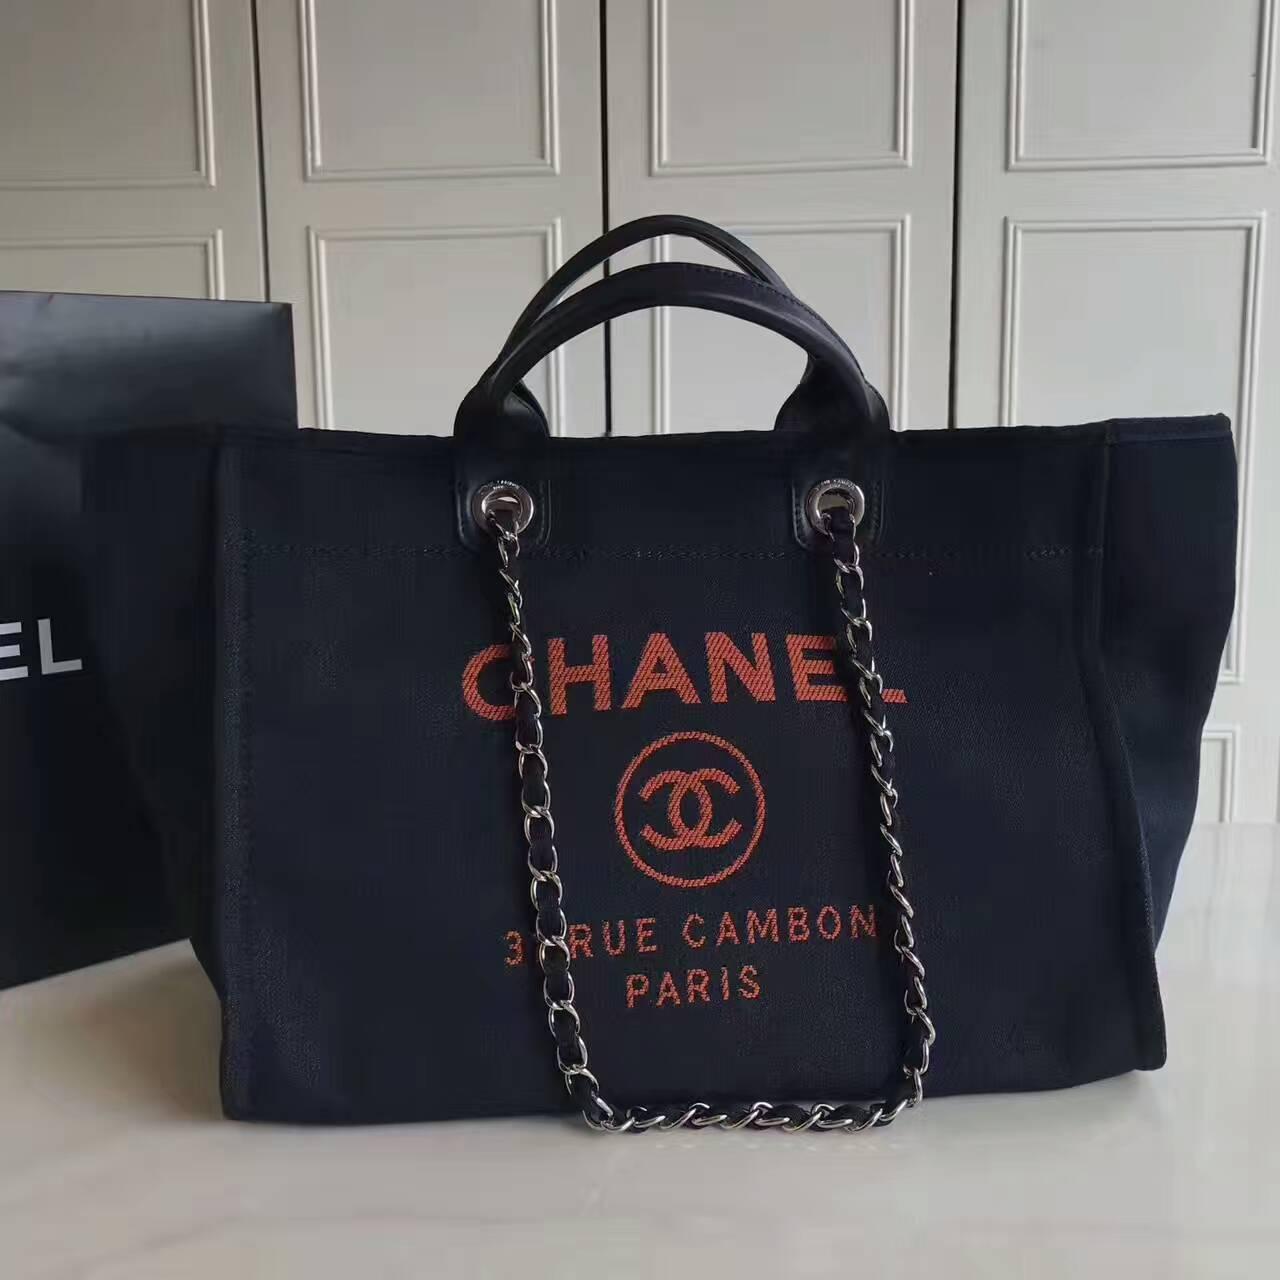 66f12914472a Сумка Chanel shopping большая фото 1 ...